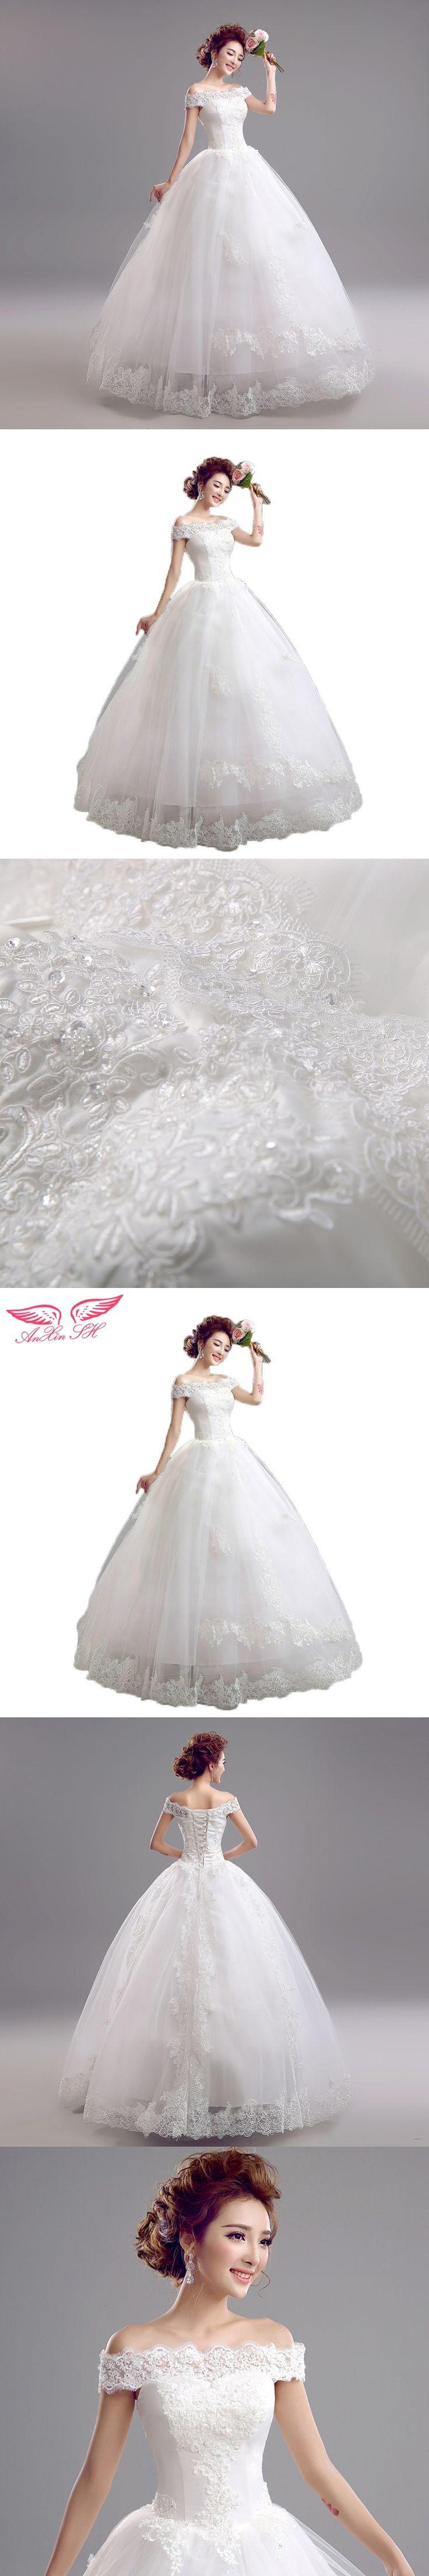 AnXin SH Korean bride lace wedding dress shoulder strap slim word  Princess wedding Dress New Winter 5956